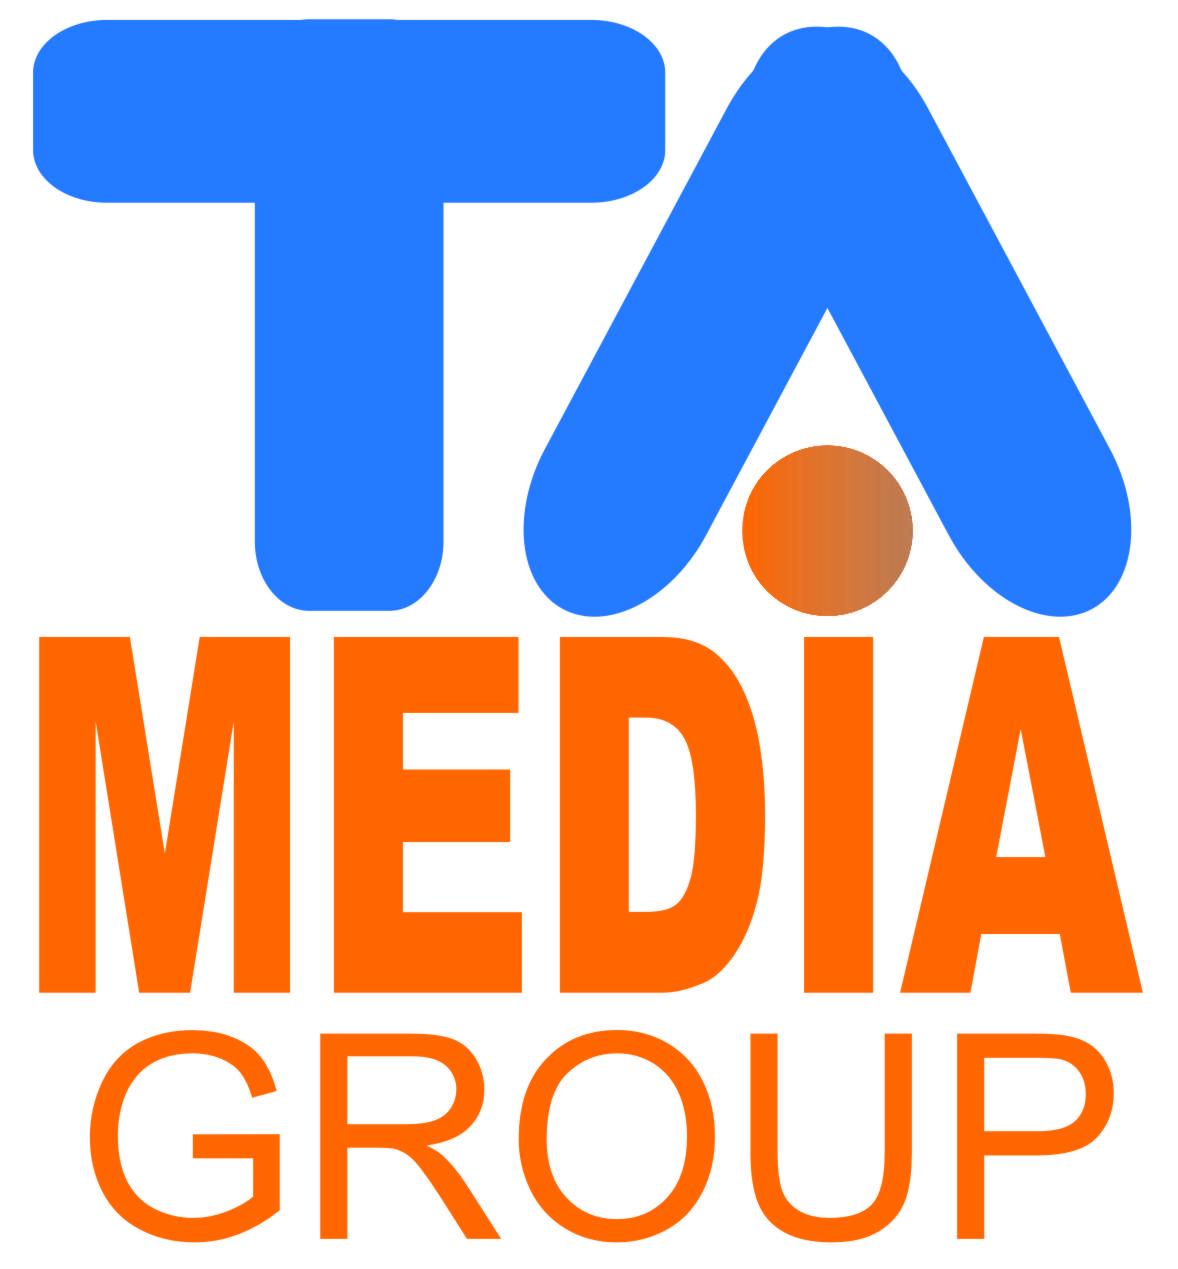 Lowongan Sukoharjo Portal Info Lowongan Kerja Terbaru Di Solo Raya Lowongan Kerja Di Ta Media Group Solo Lowongan Kerja Terbaru Solo